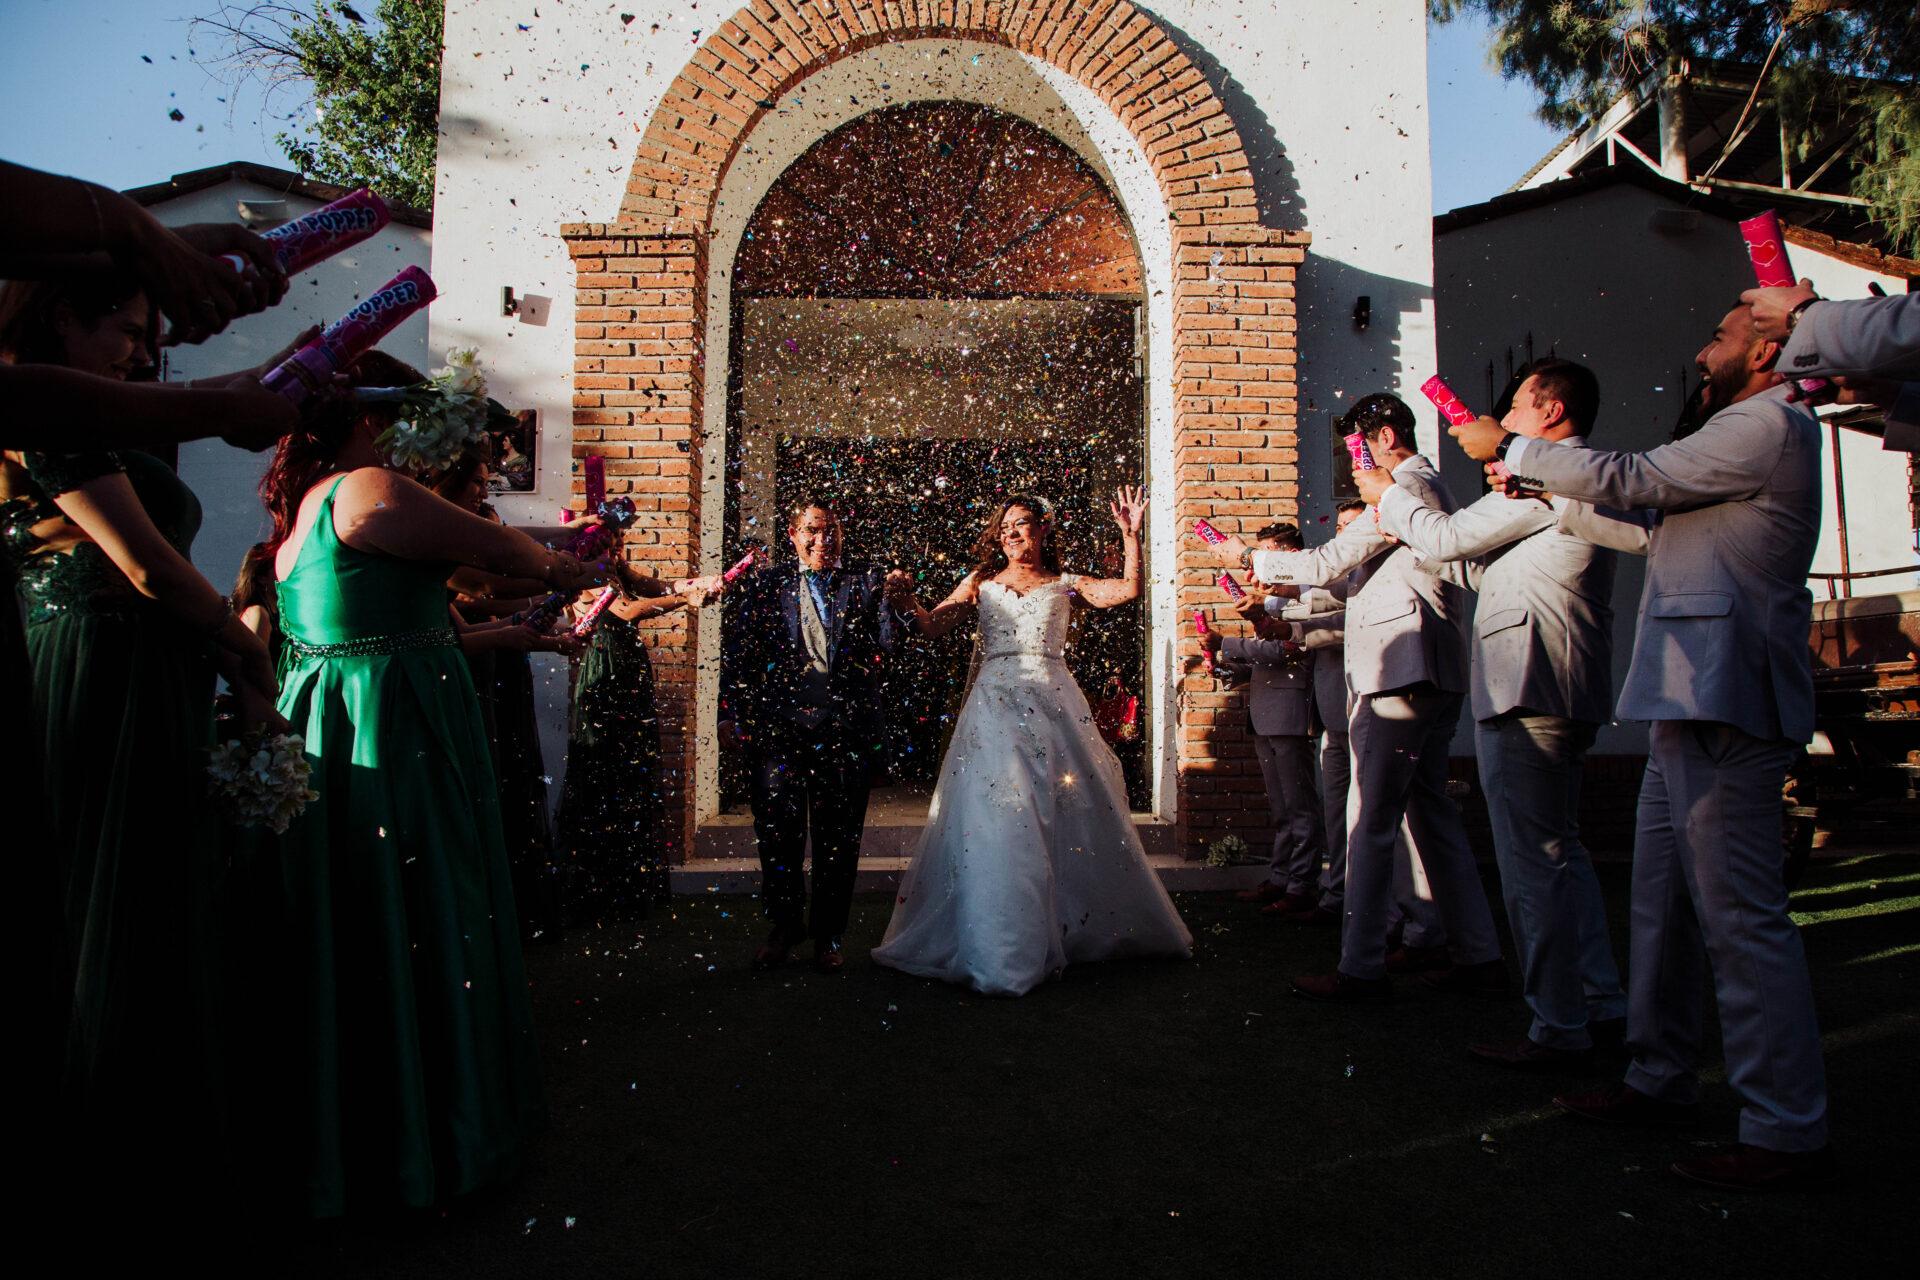 javier_noriega_fotografo_bodas_torreon_coahuila_zacatecas_wedding_photographer34a